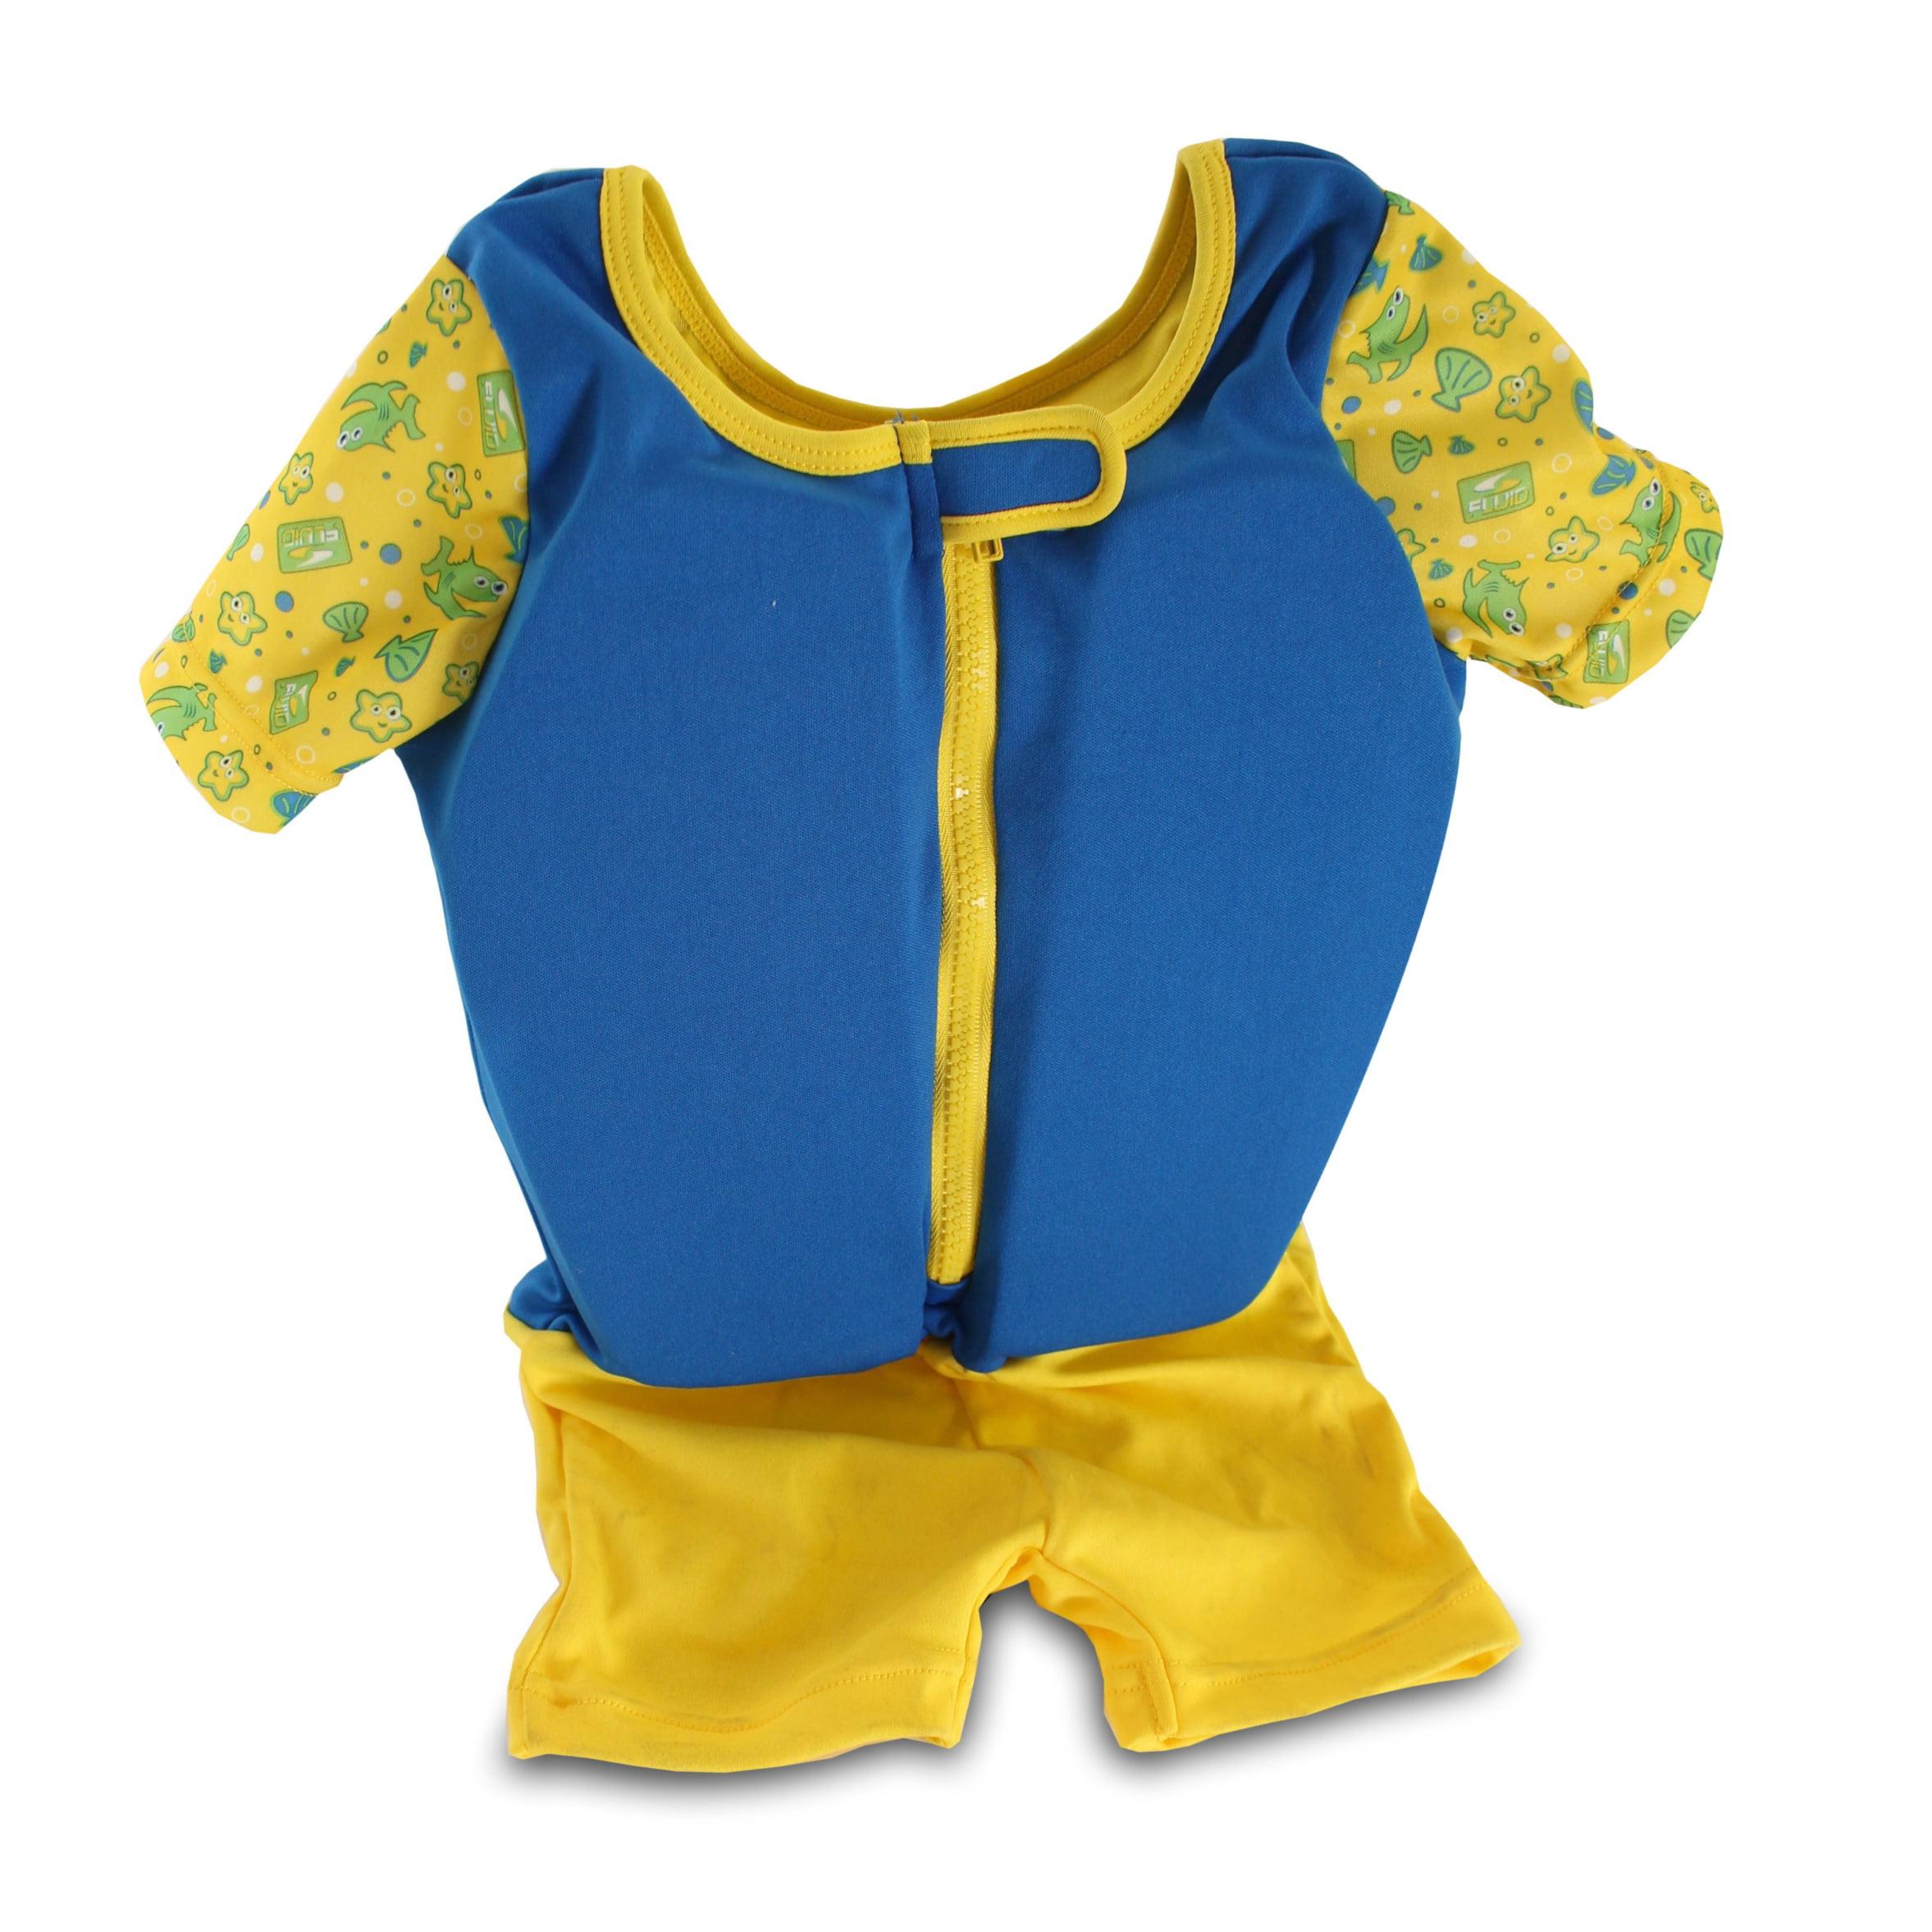 Kids Stuff Body Glove Swim Training Float Blue Suit Medium Large 33-55 lbs by